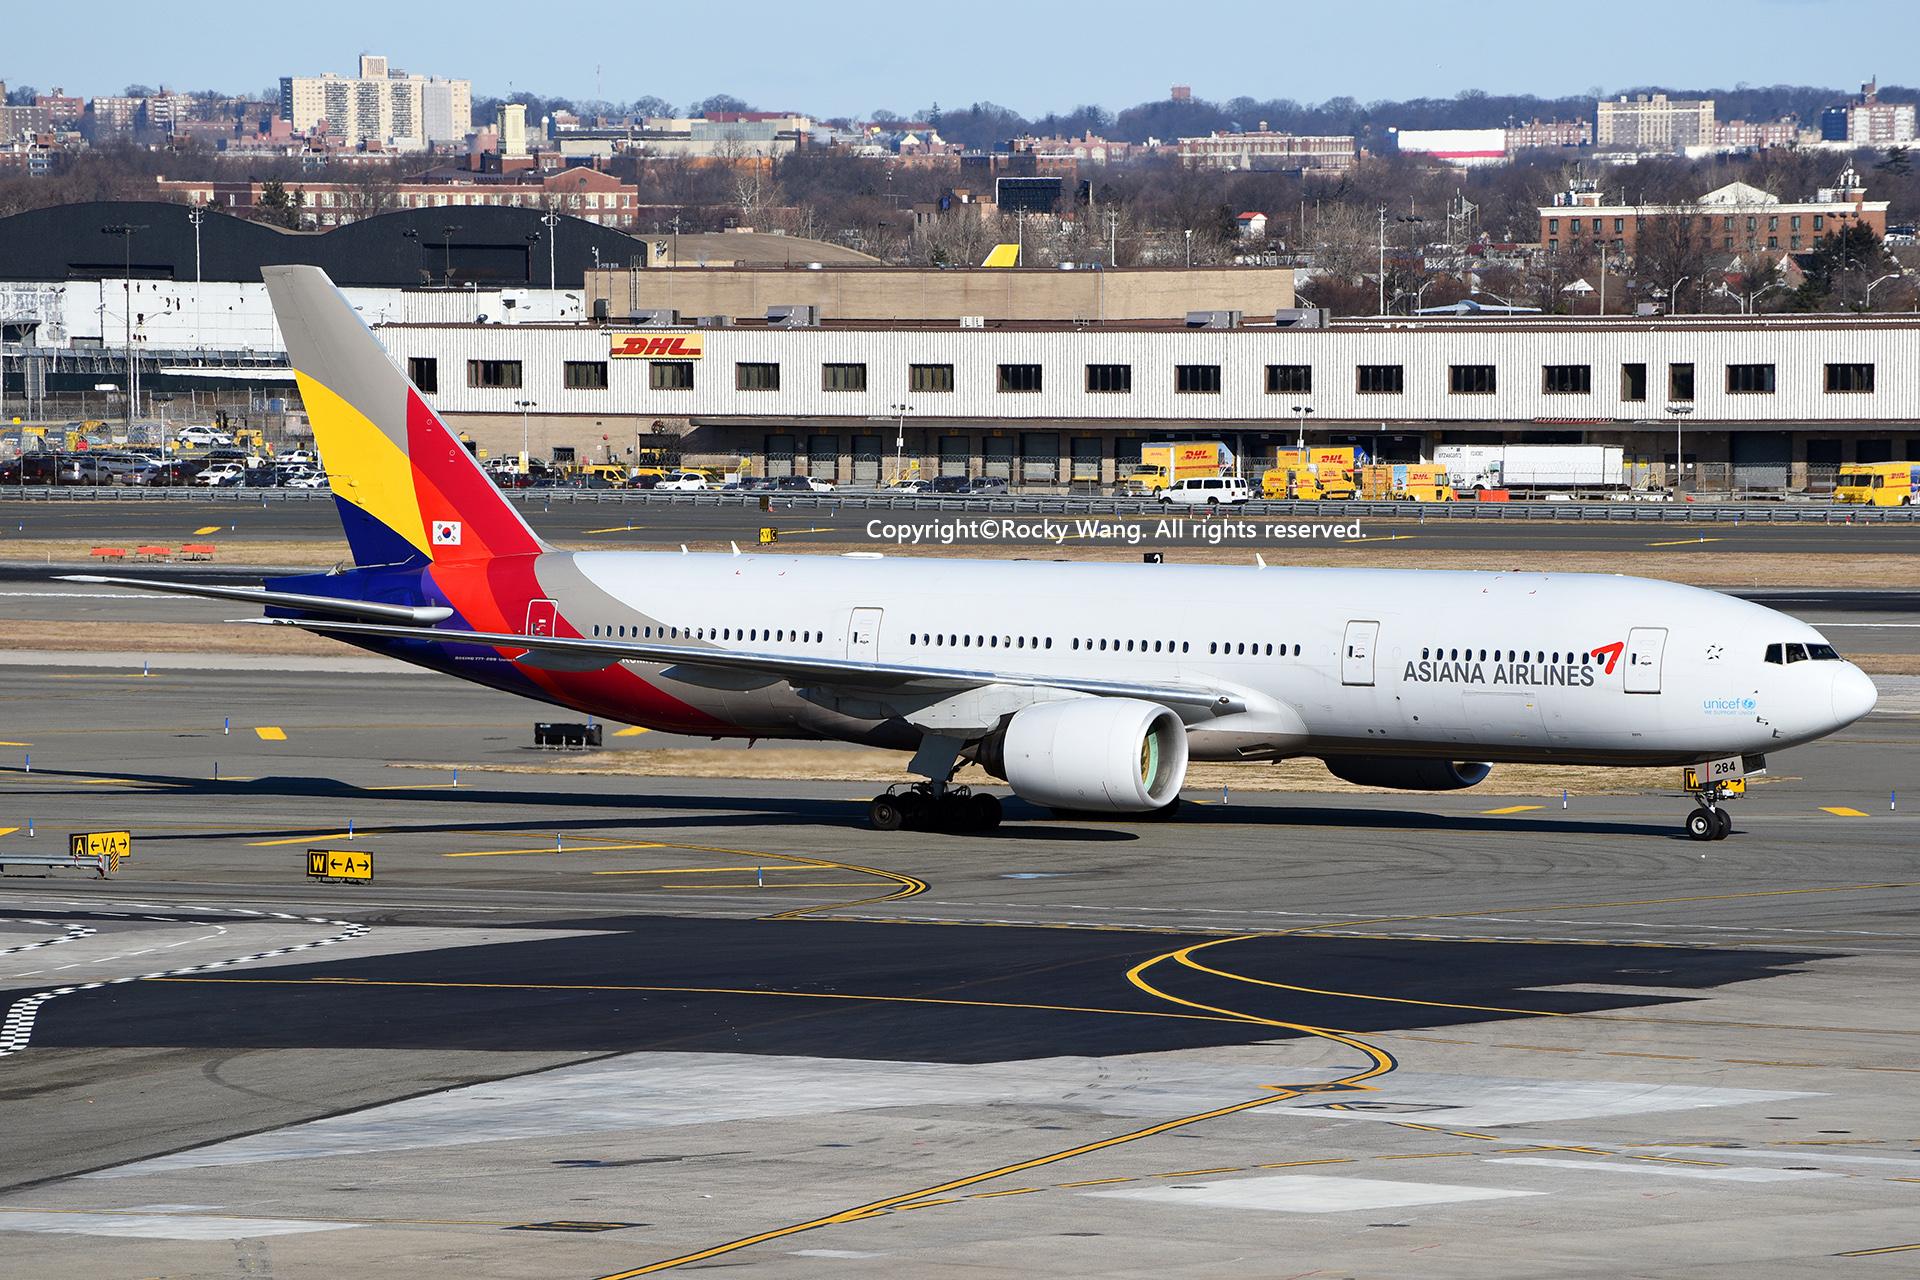 Re:[原创]居家了 批量处理老图 倾情奉献52家777 BOEING 777-28E(ER) HL8284 New York John F. Kennedy Int'l Airport